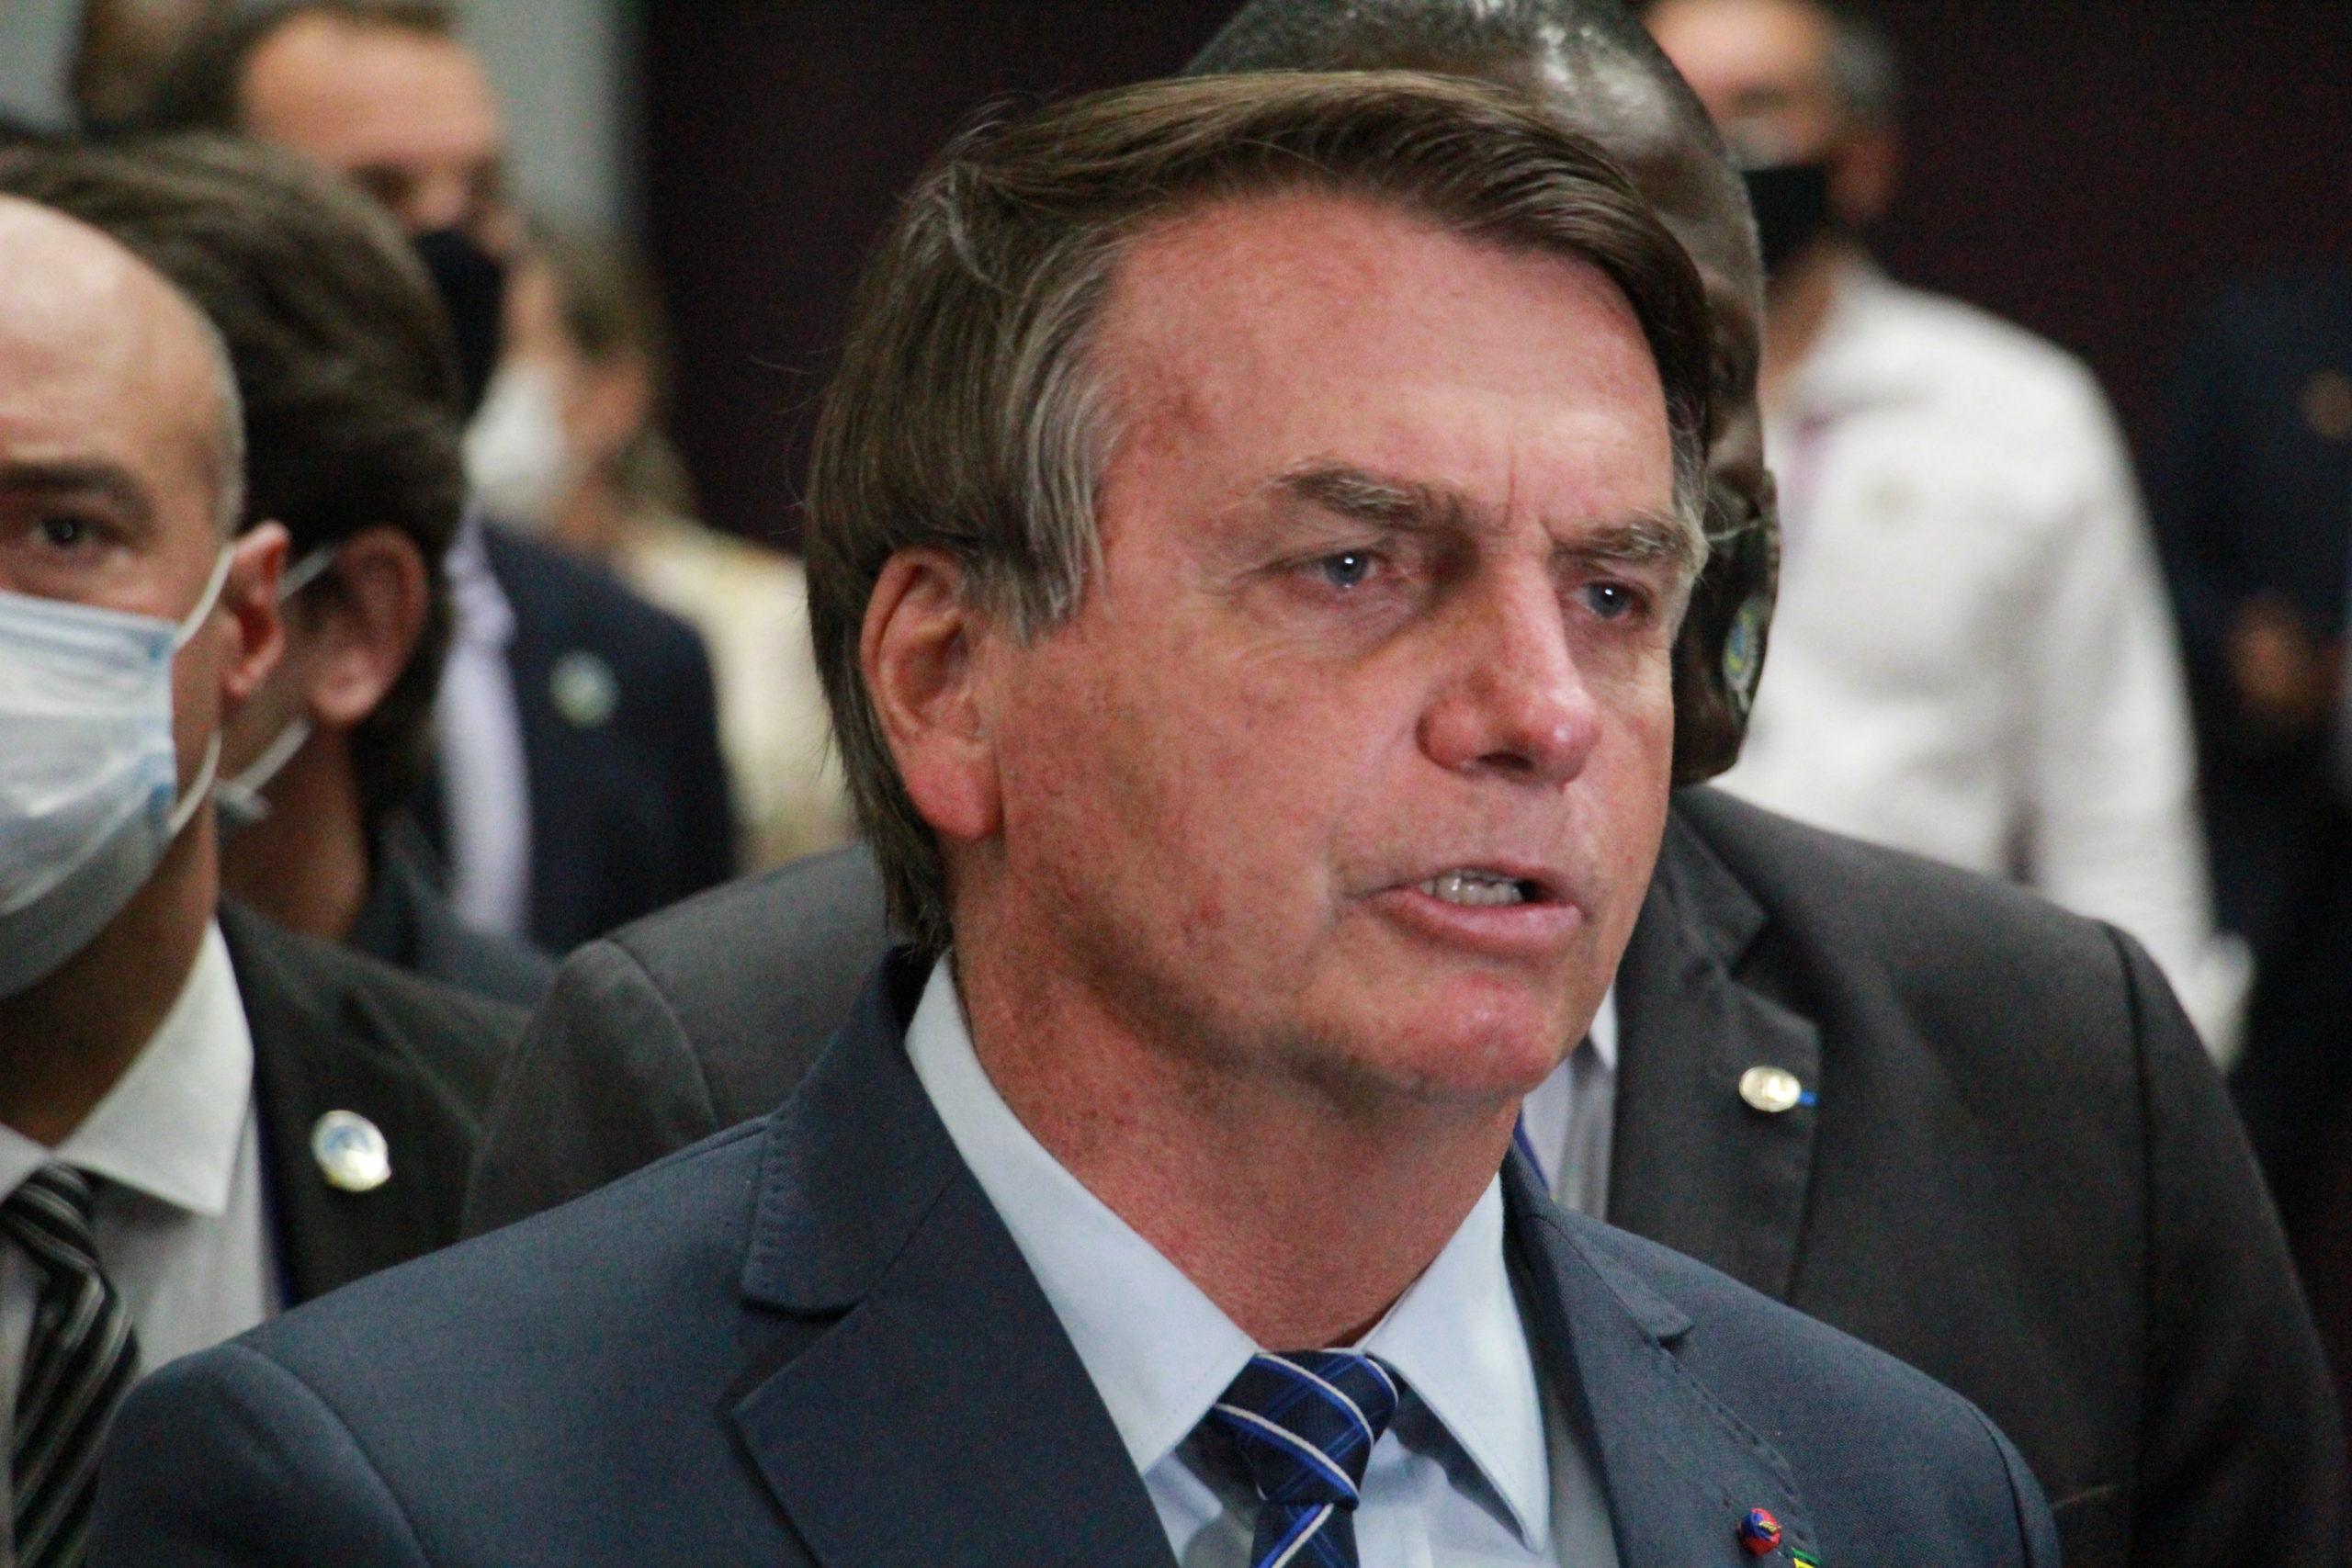 Presidente Jair Bolsonaro dando entrevista sobre o caso do motorista preso na Rússia